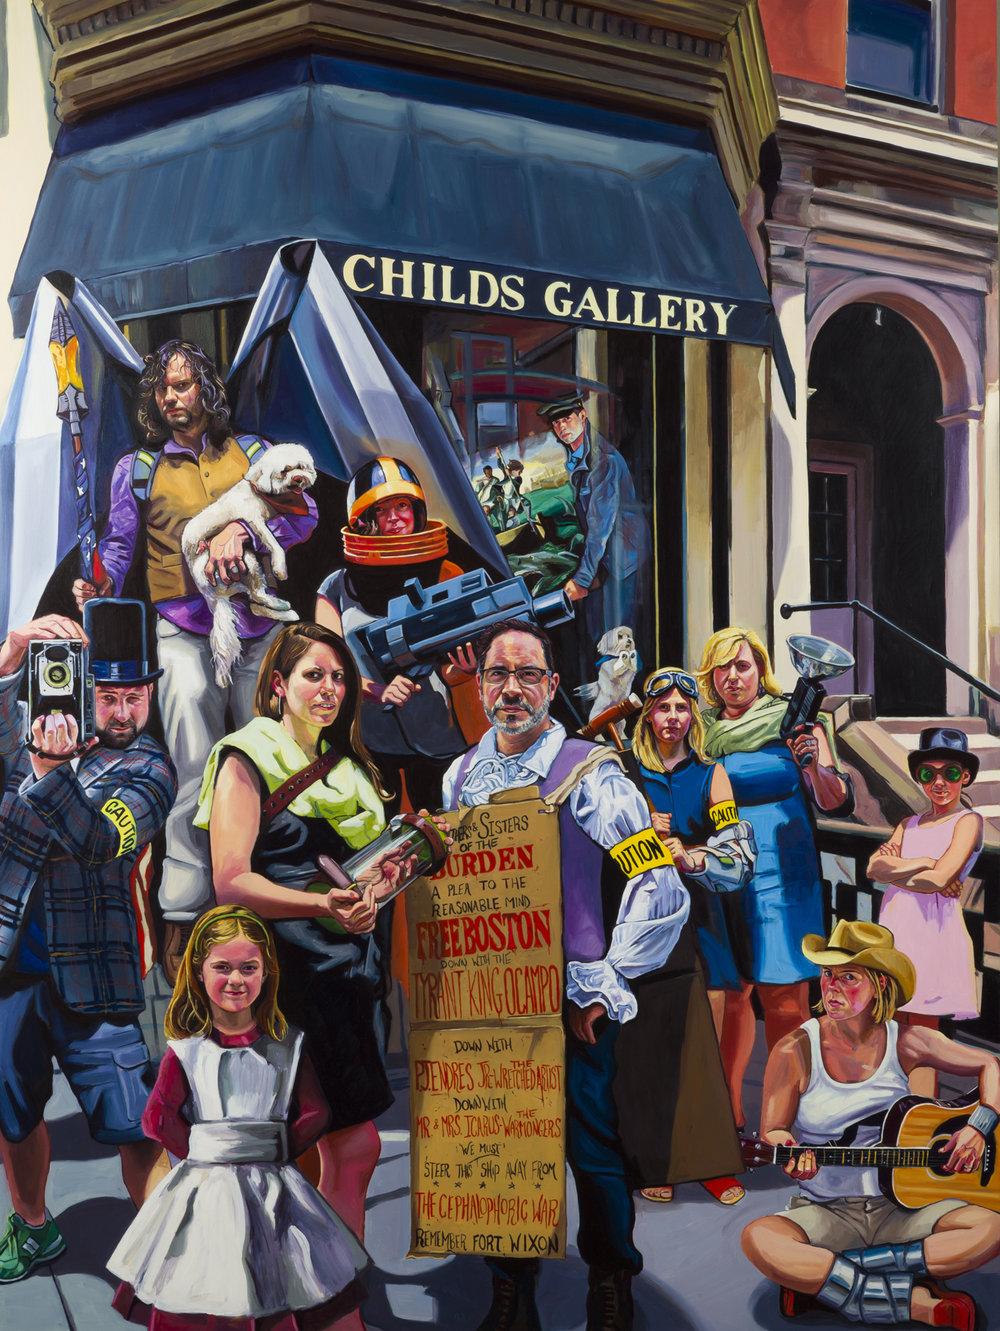 10_Endres_Paul_Childs Gallery.jpg